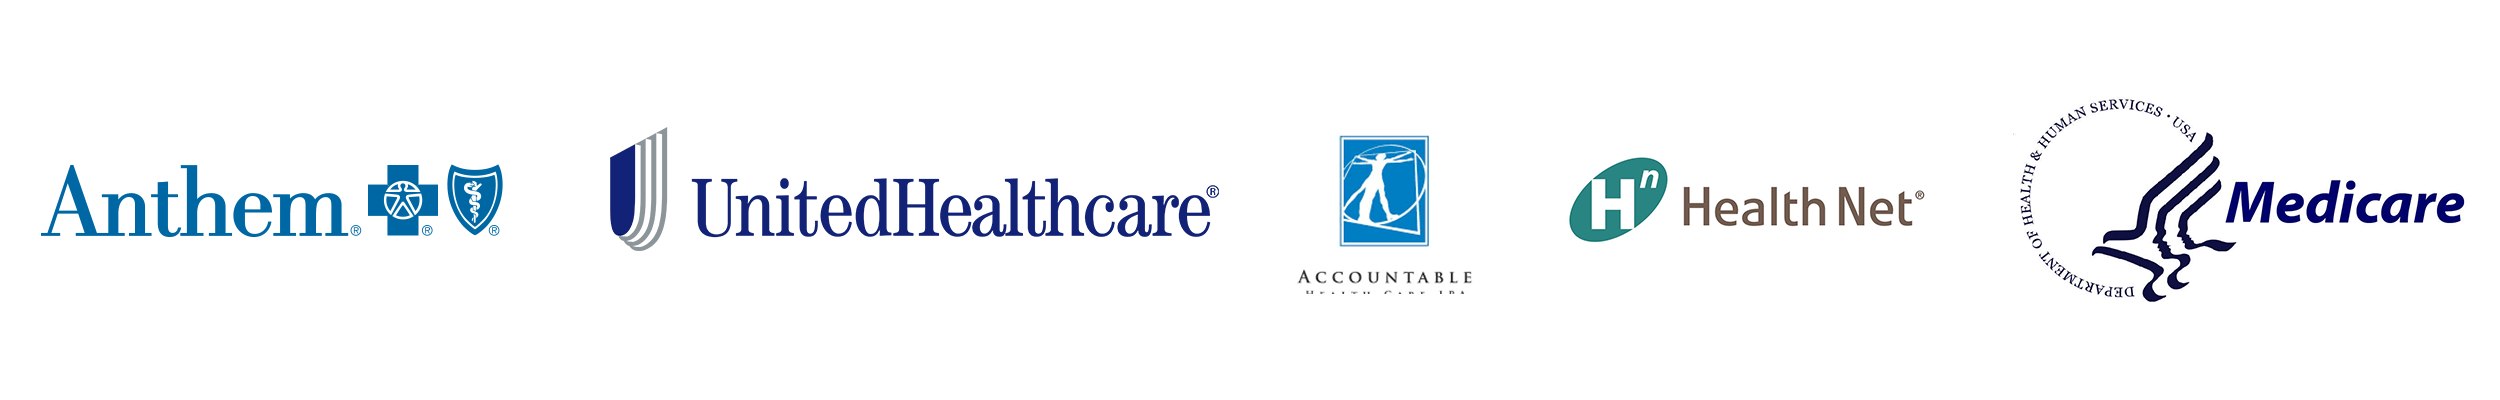 insurance-provider-logos.png